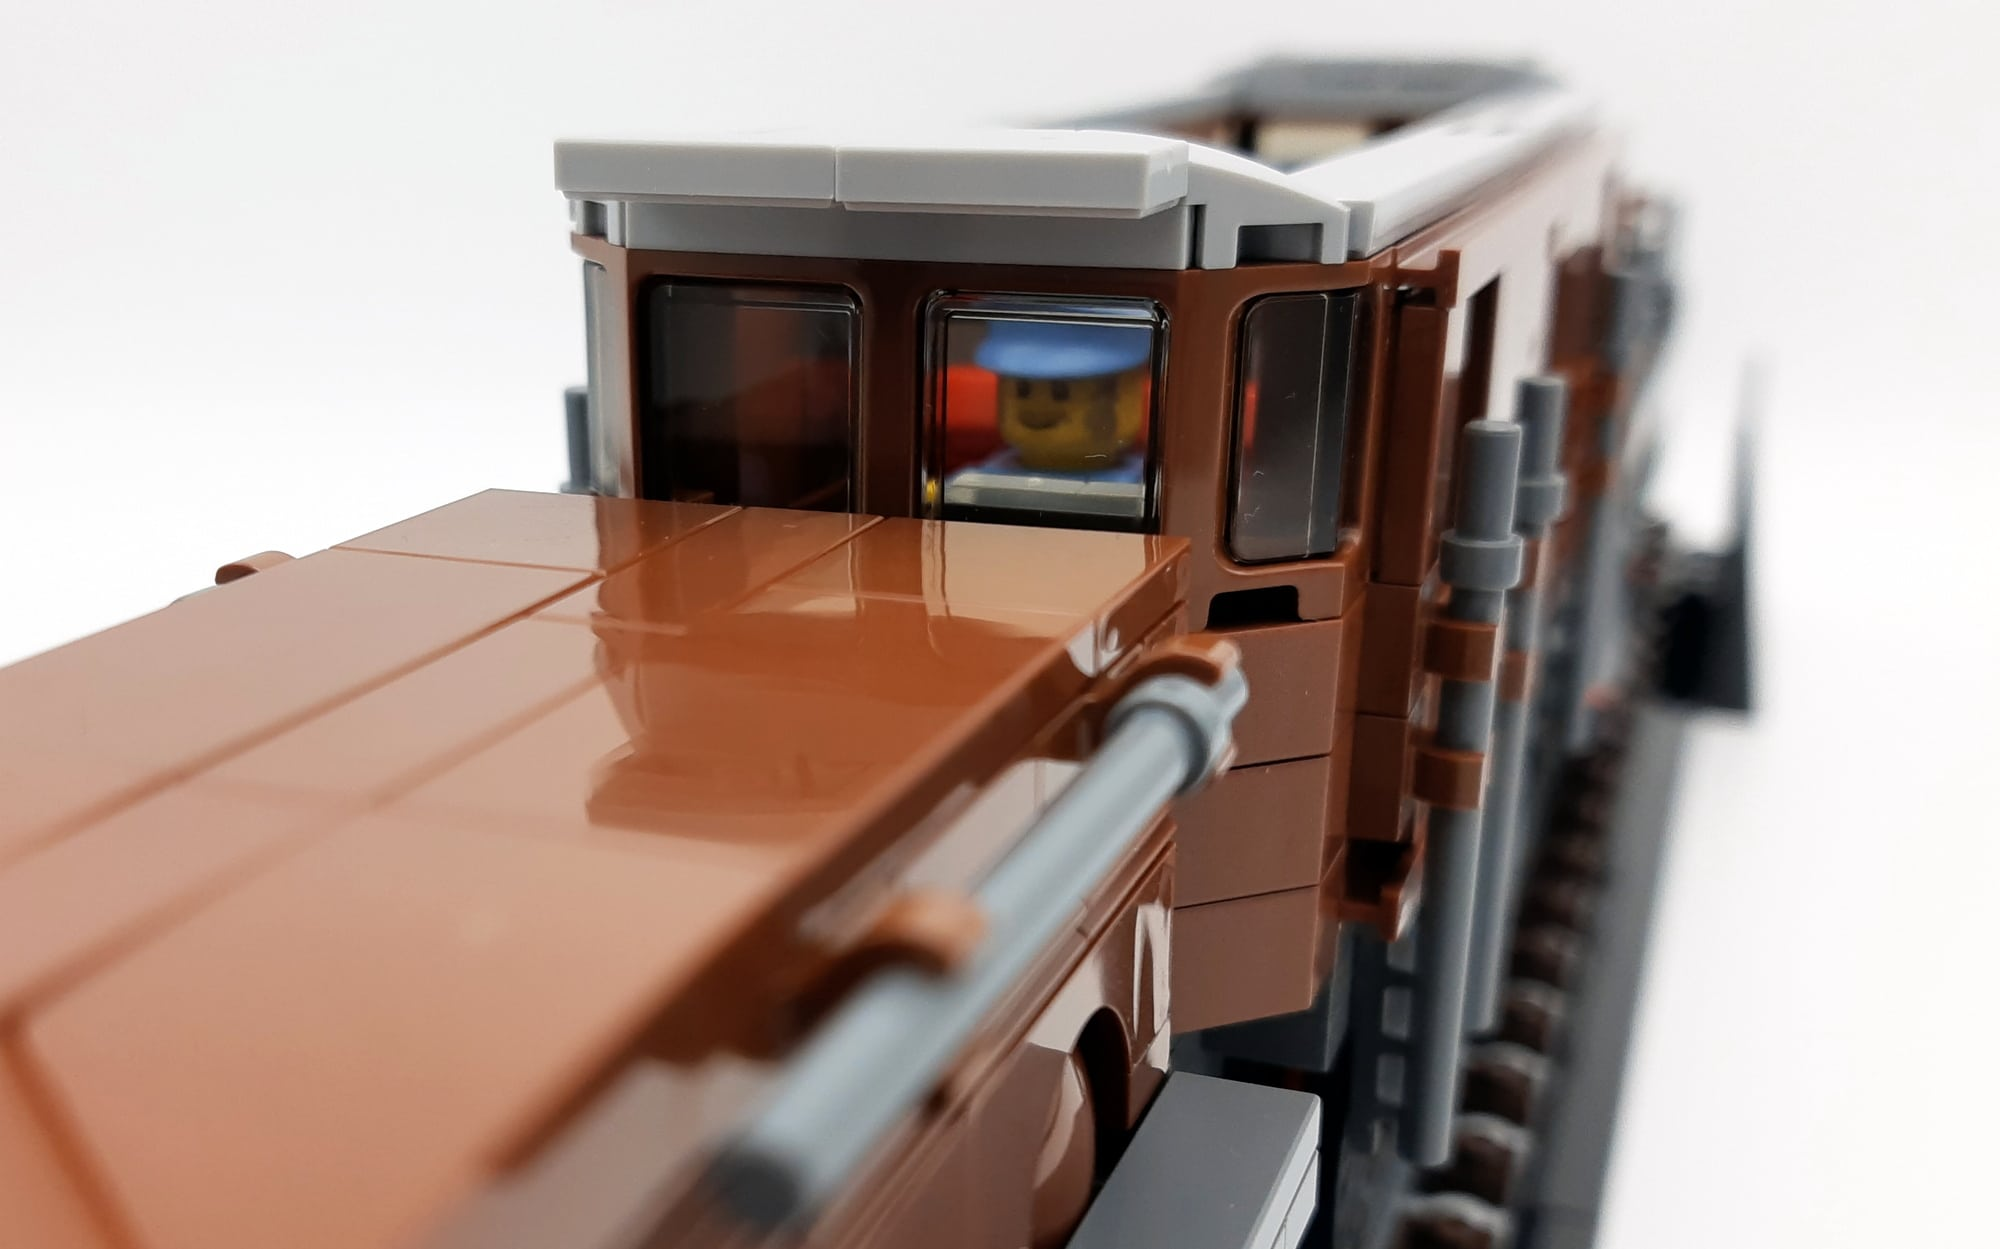 LEGO 10277 Krokodil Lokomotive - Blick in den Führerstand